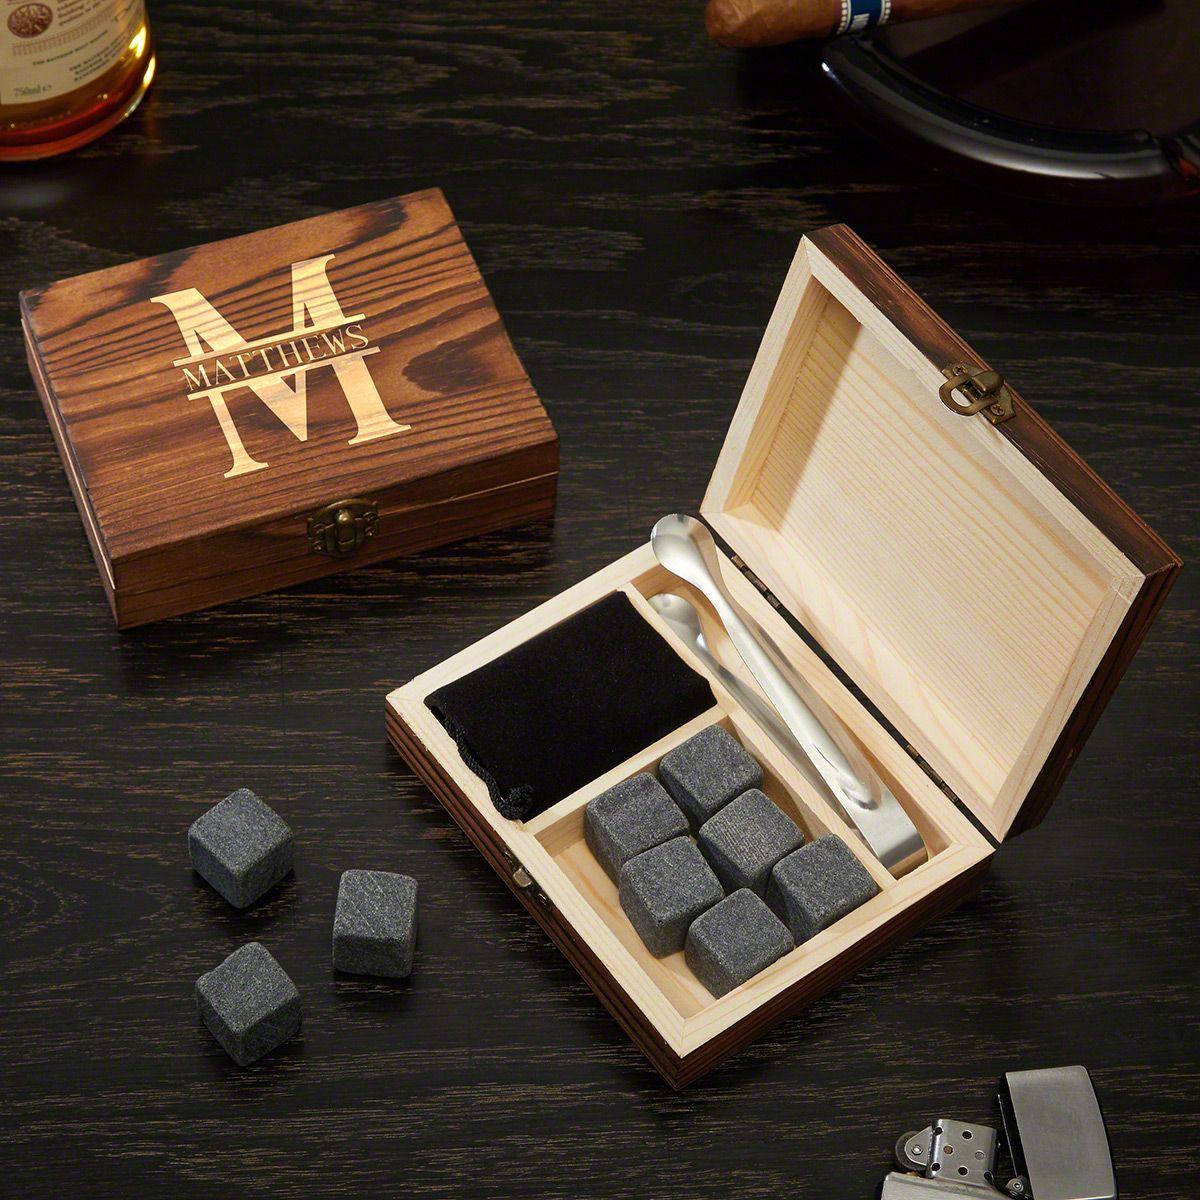 Whiskey Stones Set Gift Box with Tongs